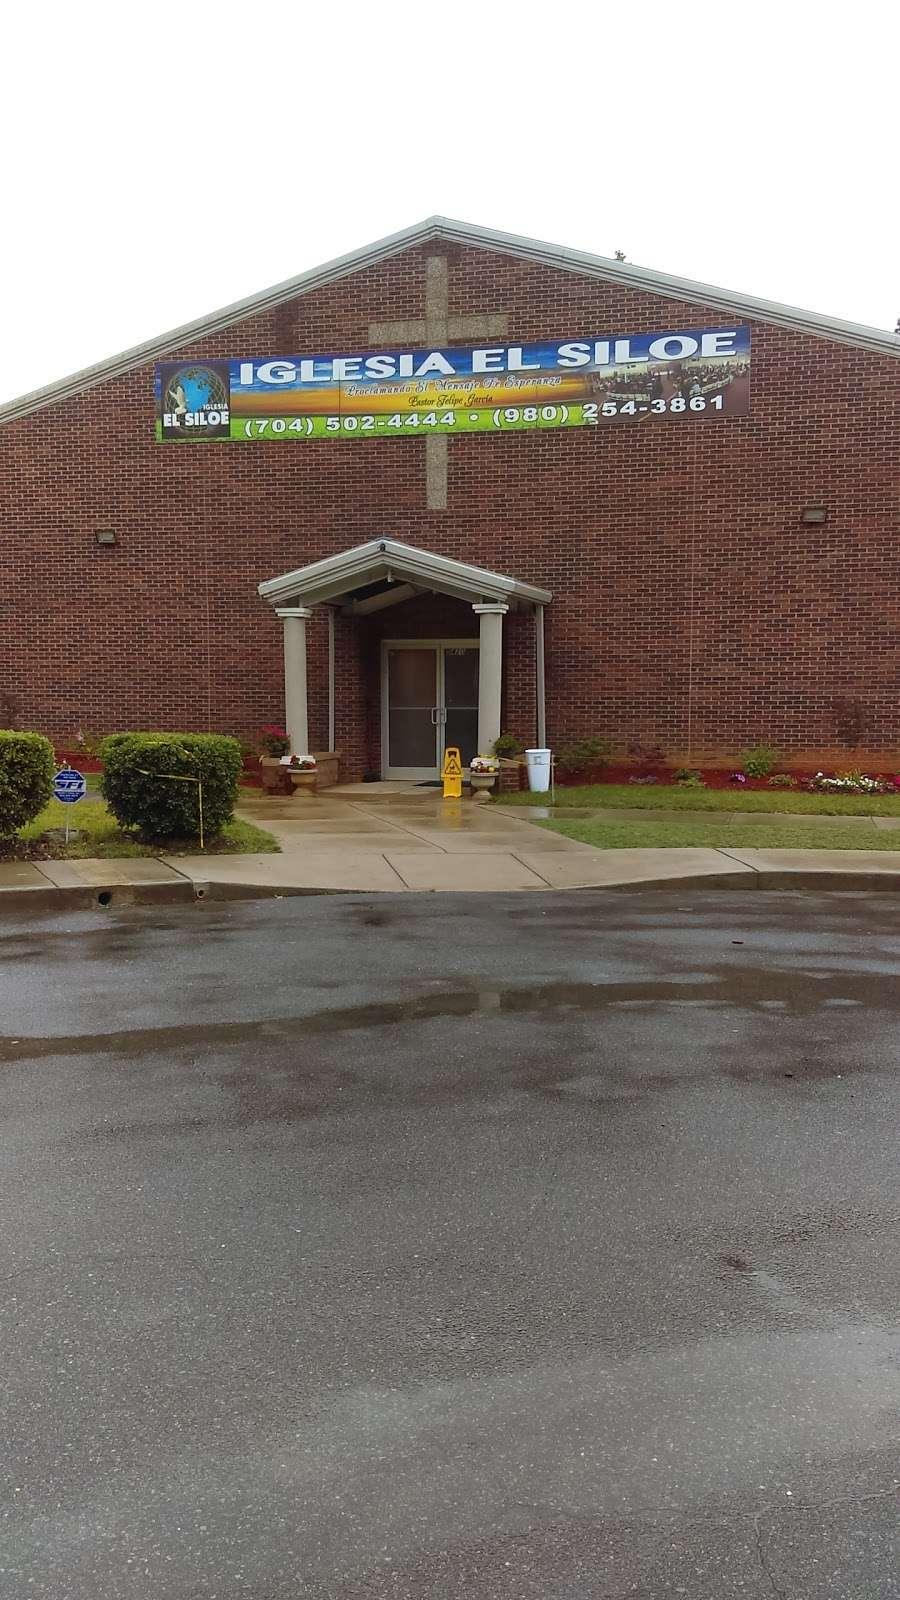 Iglesia El Siloe - church  | Photo 3 of 10 | Address: 5420 Kimmerly Glen Ln, Charlotte, NC 28215, USA | Phone: (704) 502-4444